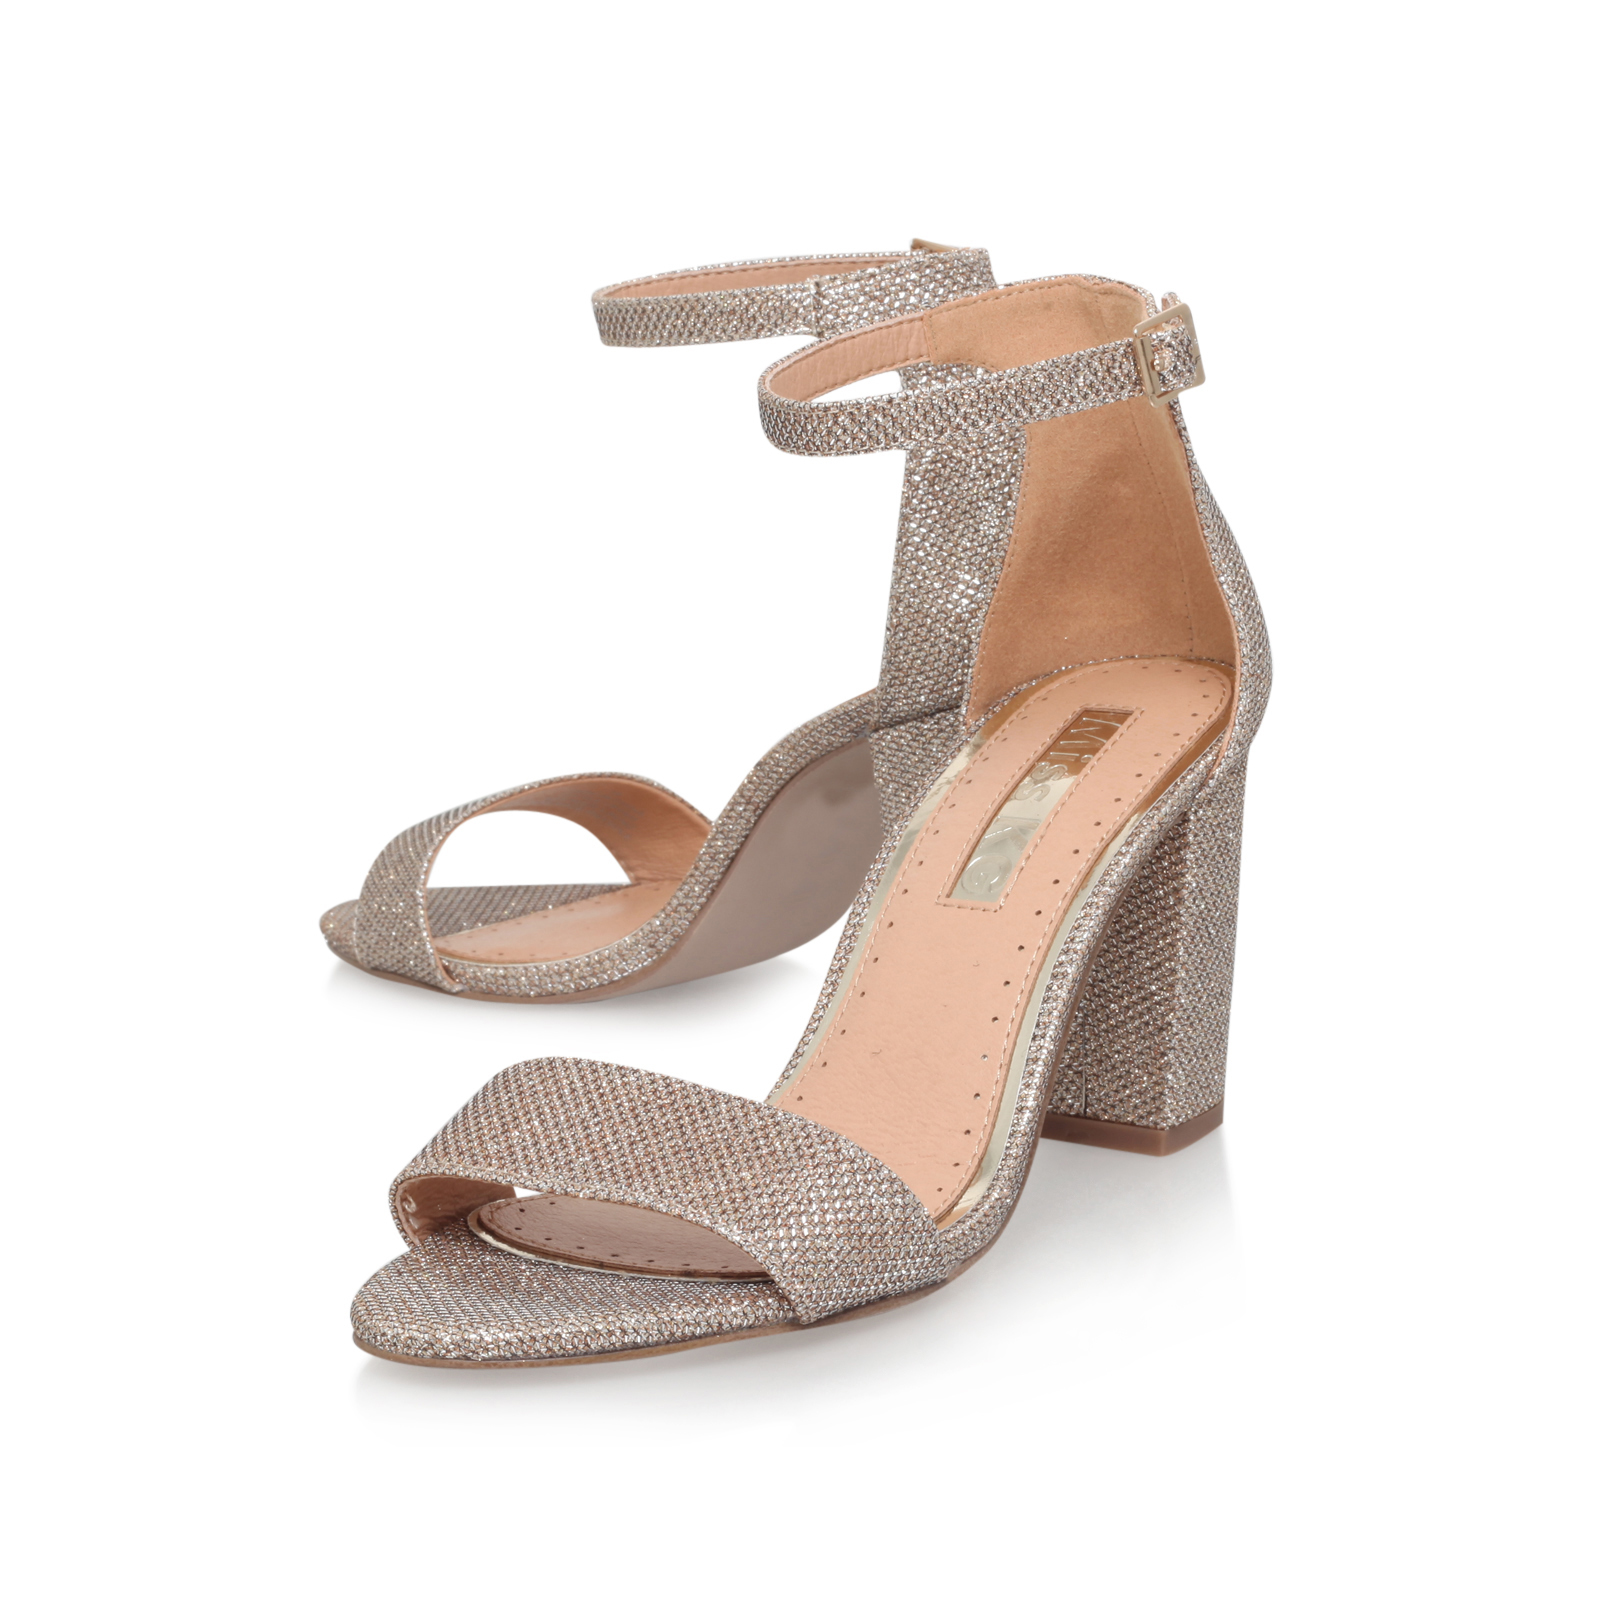 PEARL Miss KG Pearl Gold Mid Heel Sandals Block Heel by MISS KG 52840d649c7d